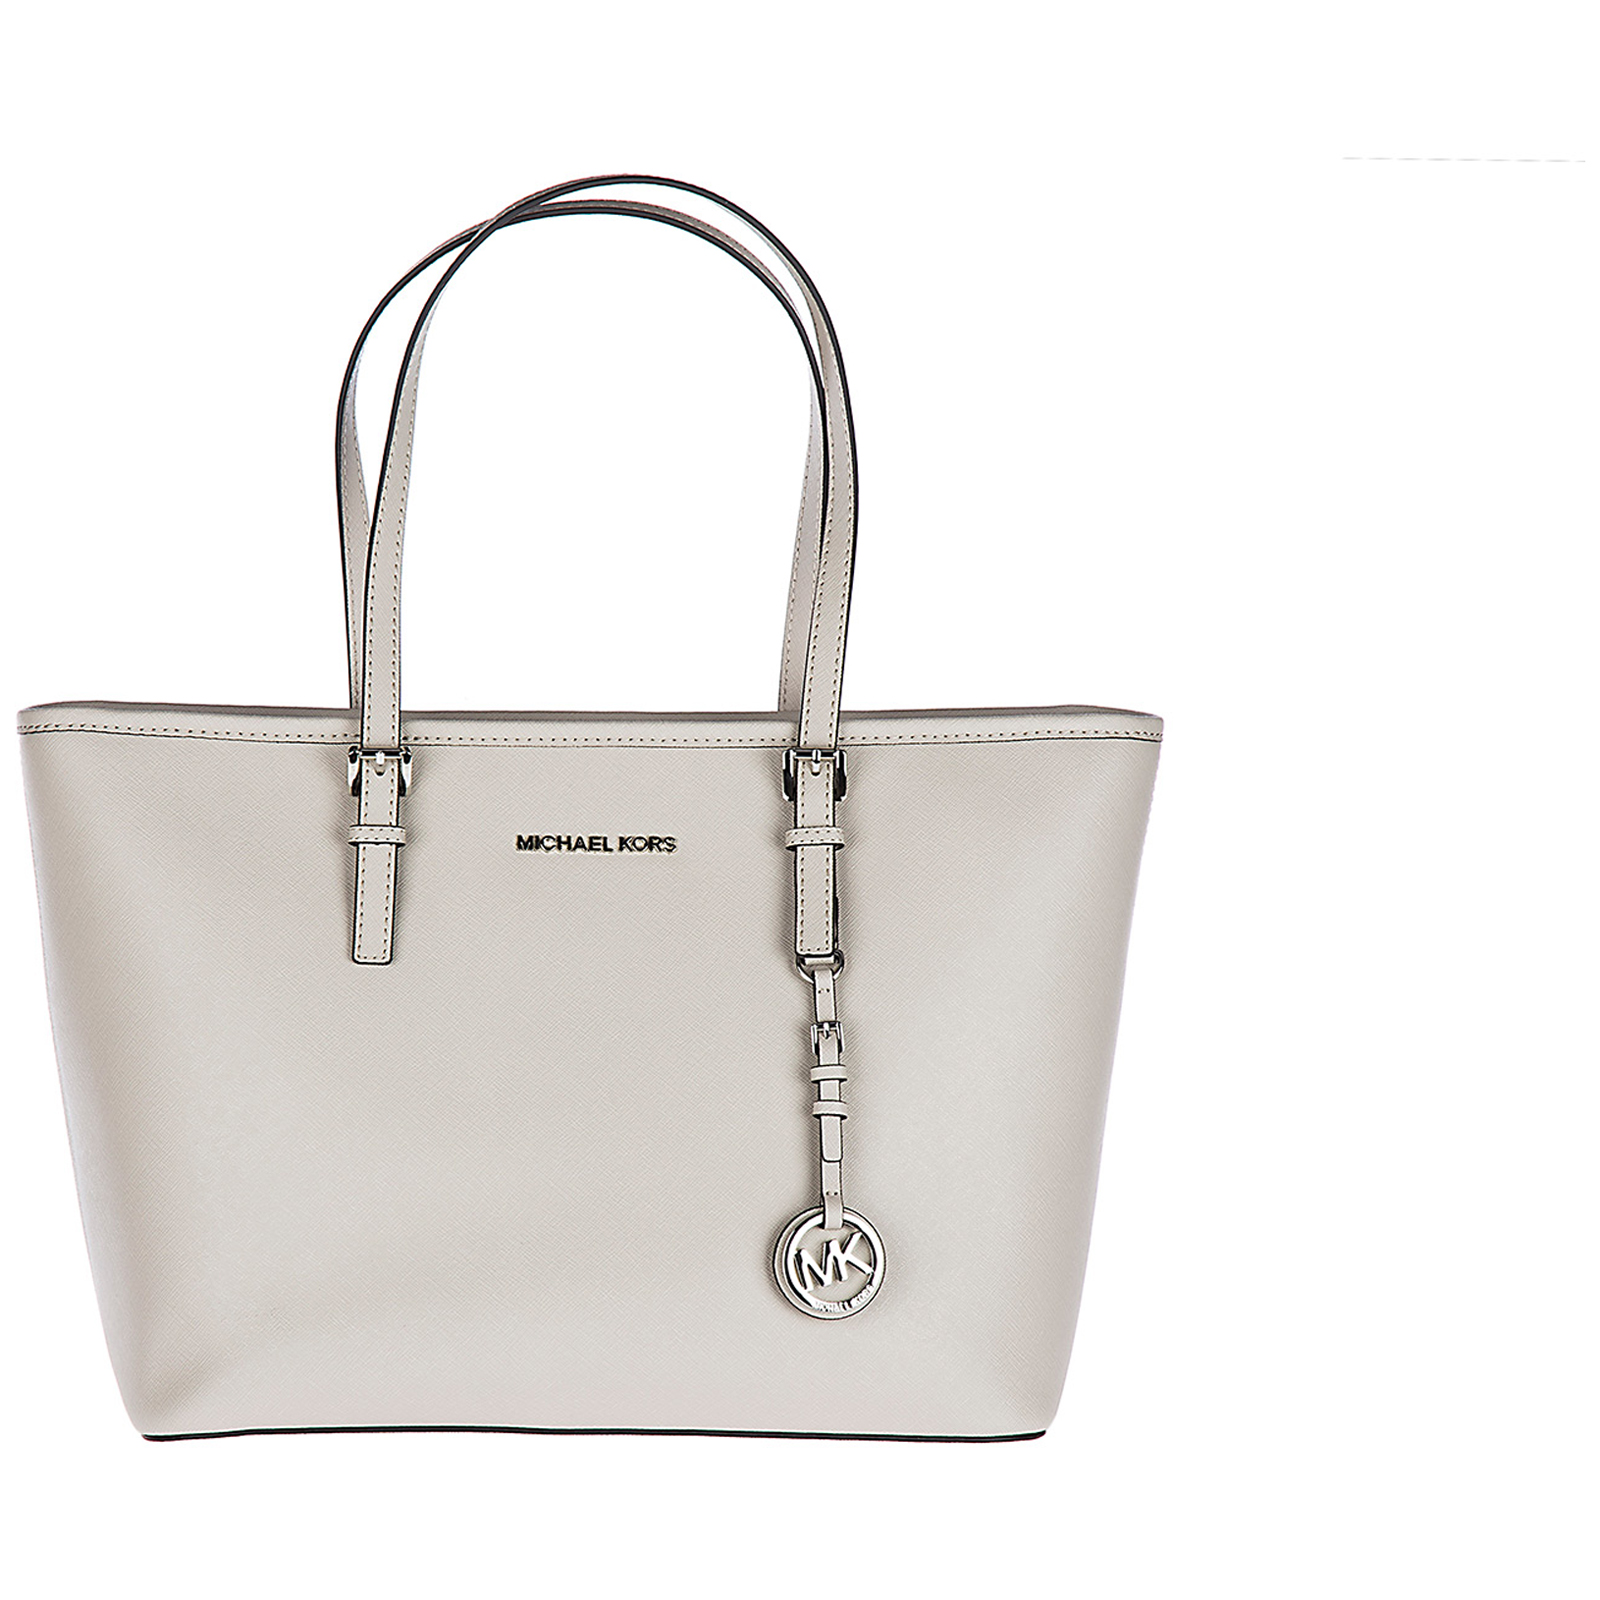 Women s leather shoulder bag jet set travel t z tote ... 7c6a38a044f